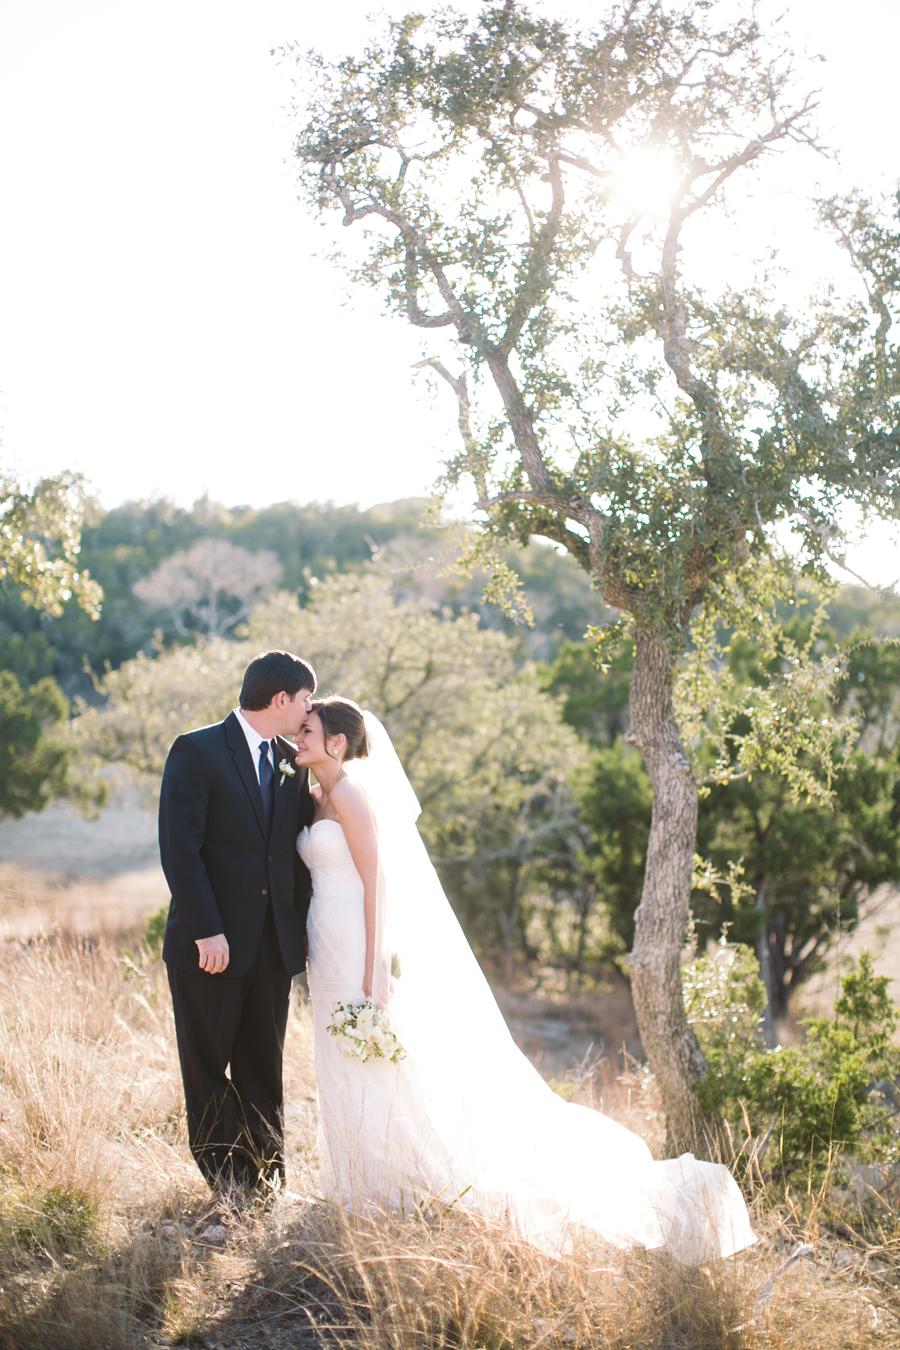 Rancho_Mirando_wedding_18